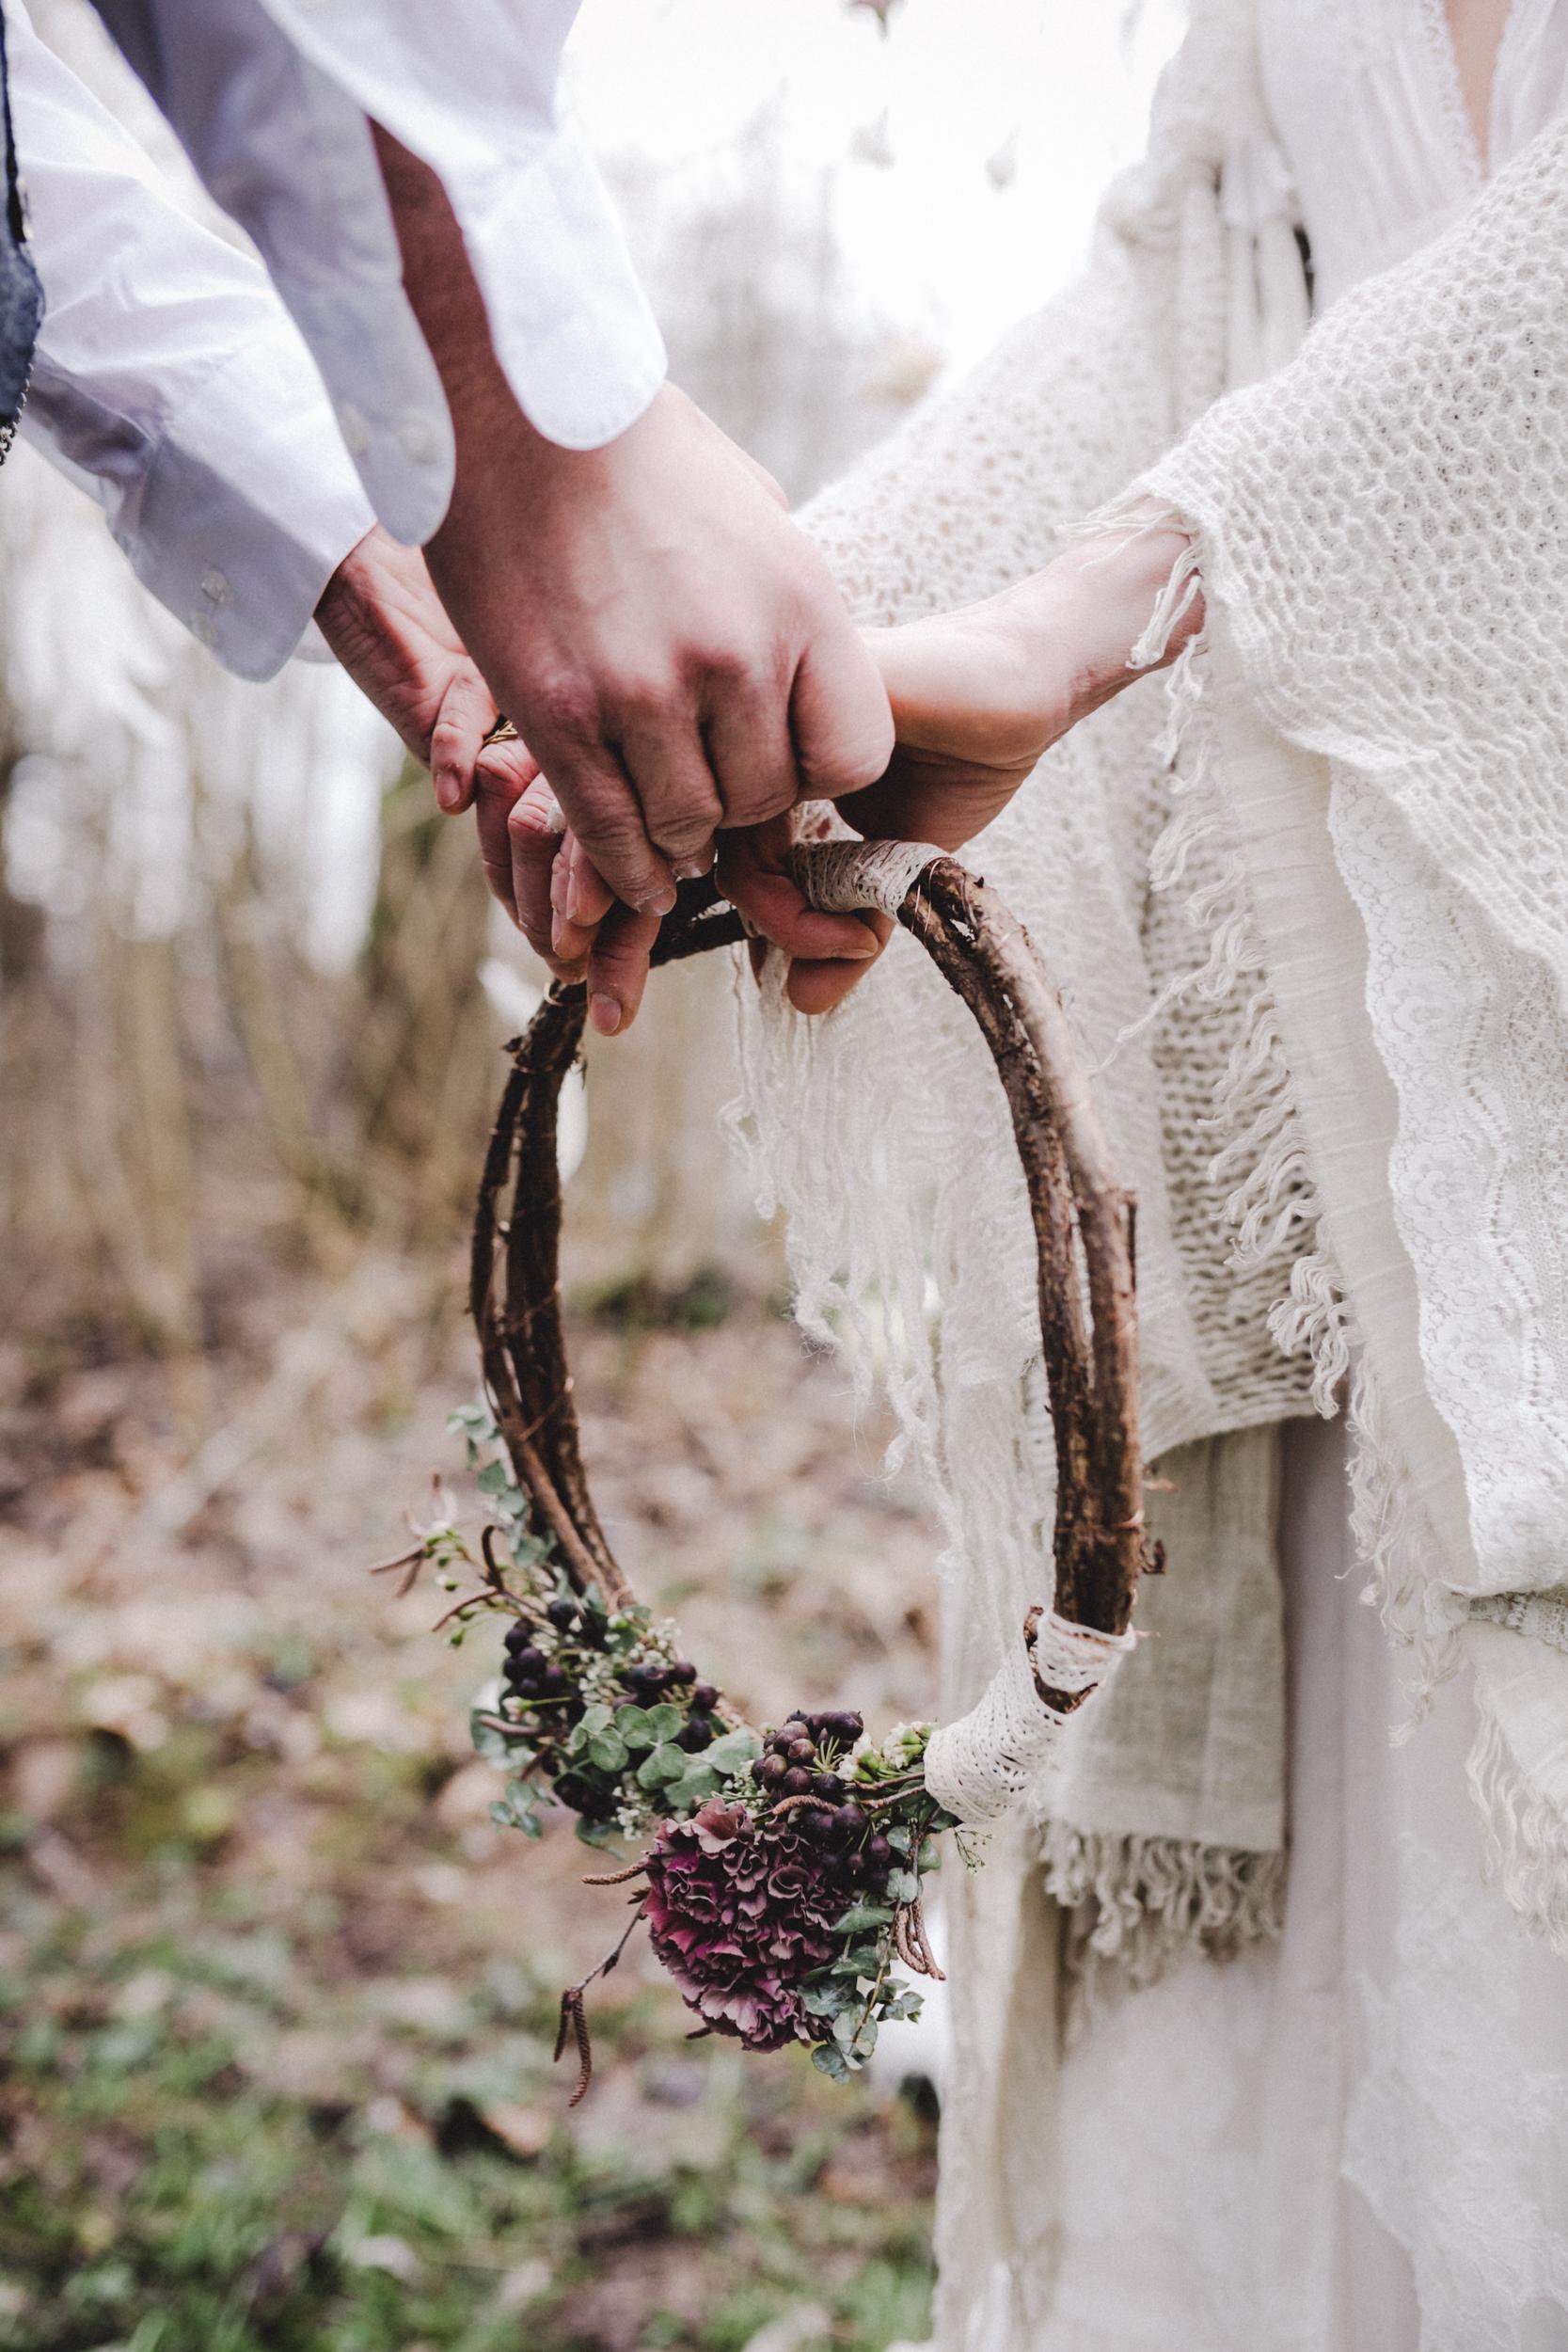 Fotos:  Hochzeitsfotografin Nadja Osieka